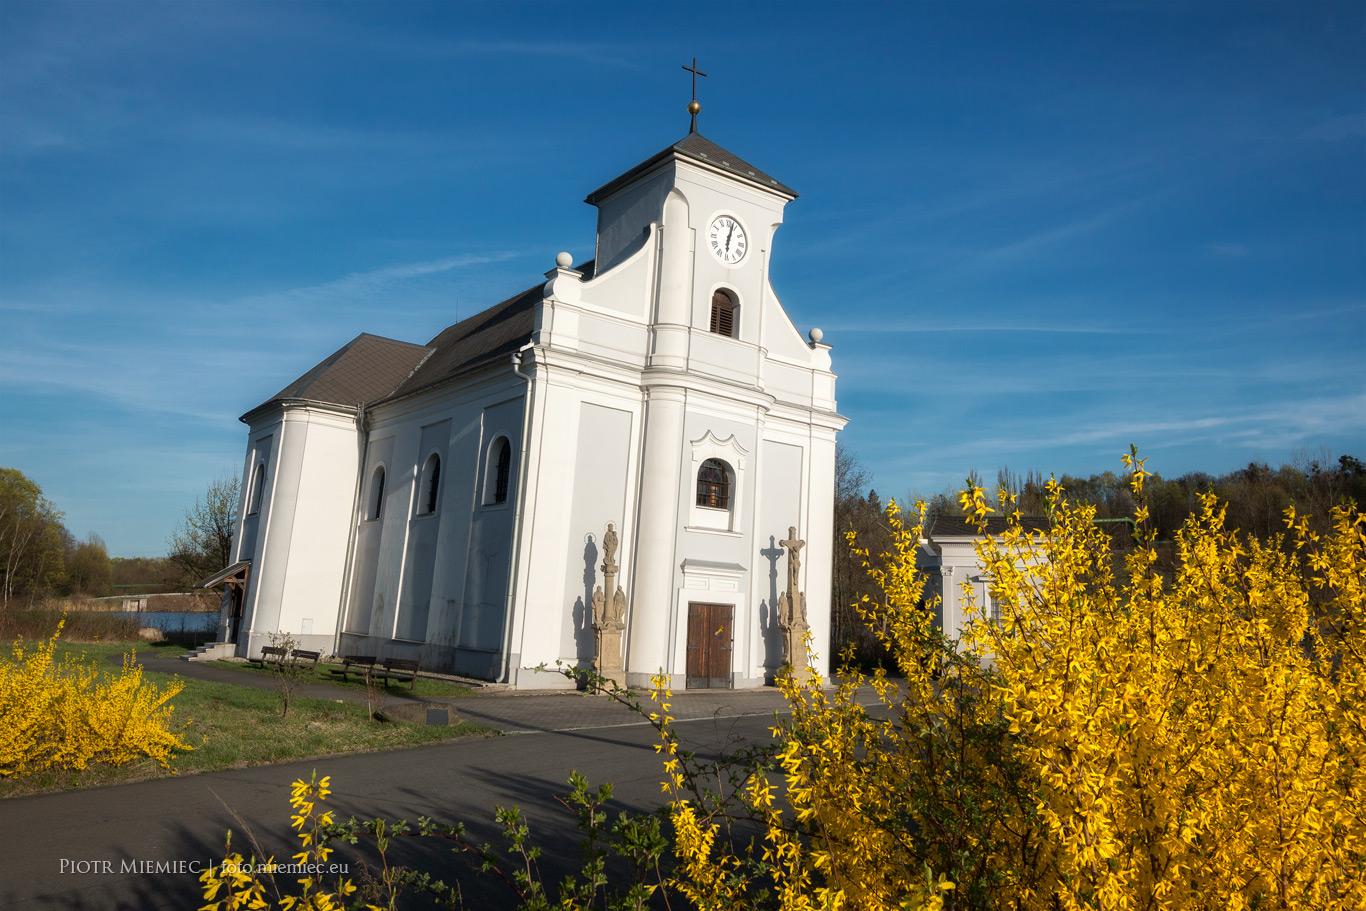 Karwina Kościół św. Piotra z Alkantary IMG_7504